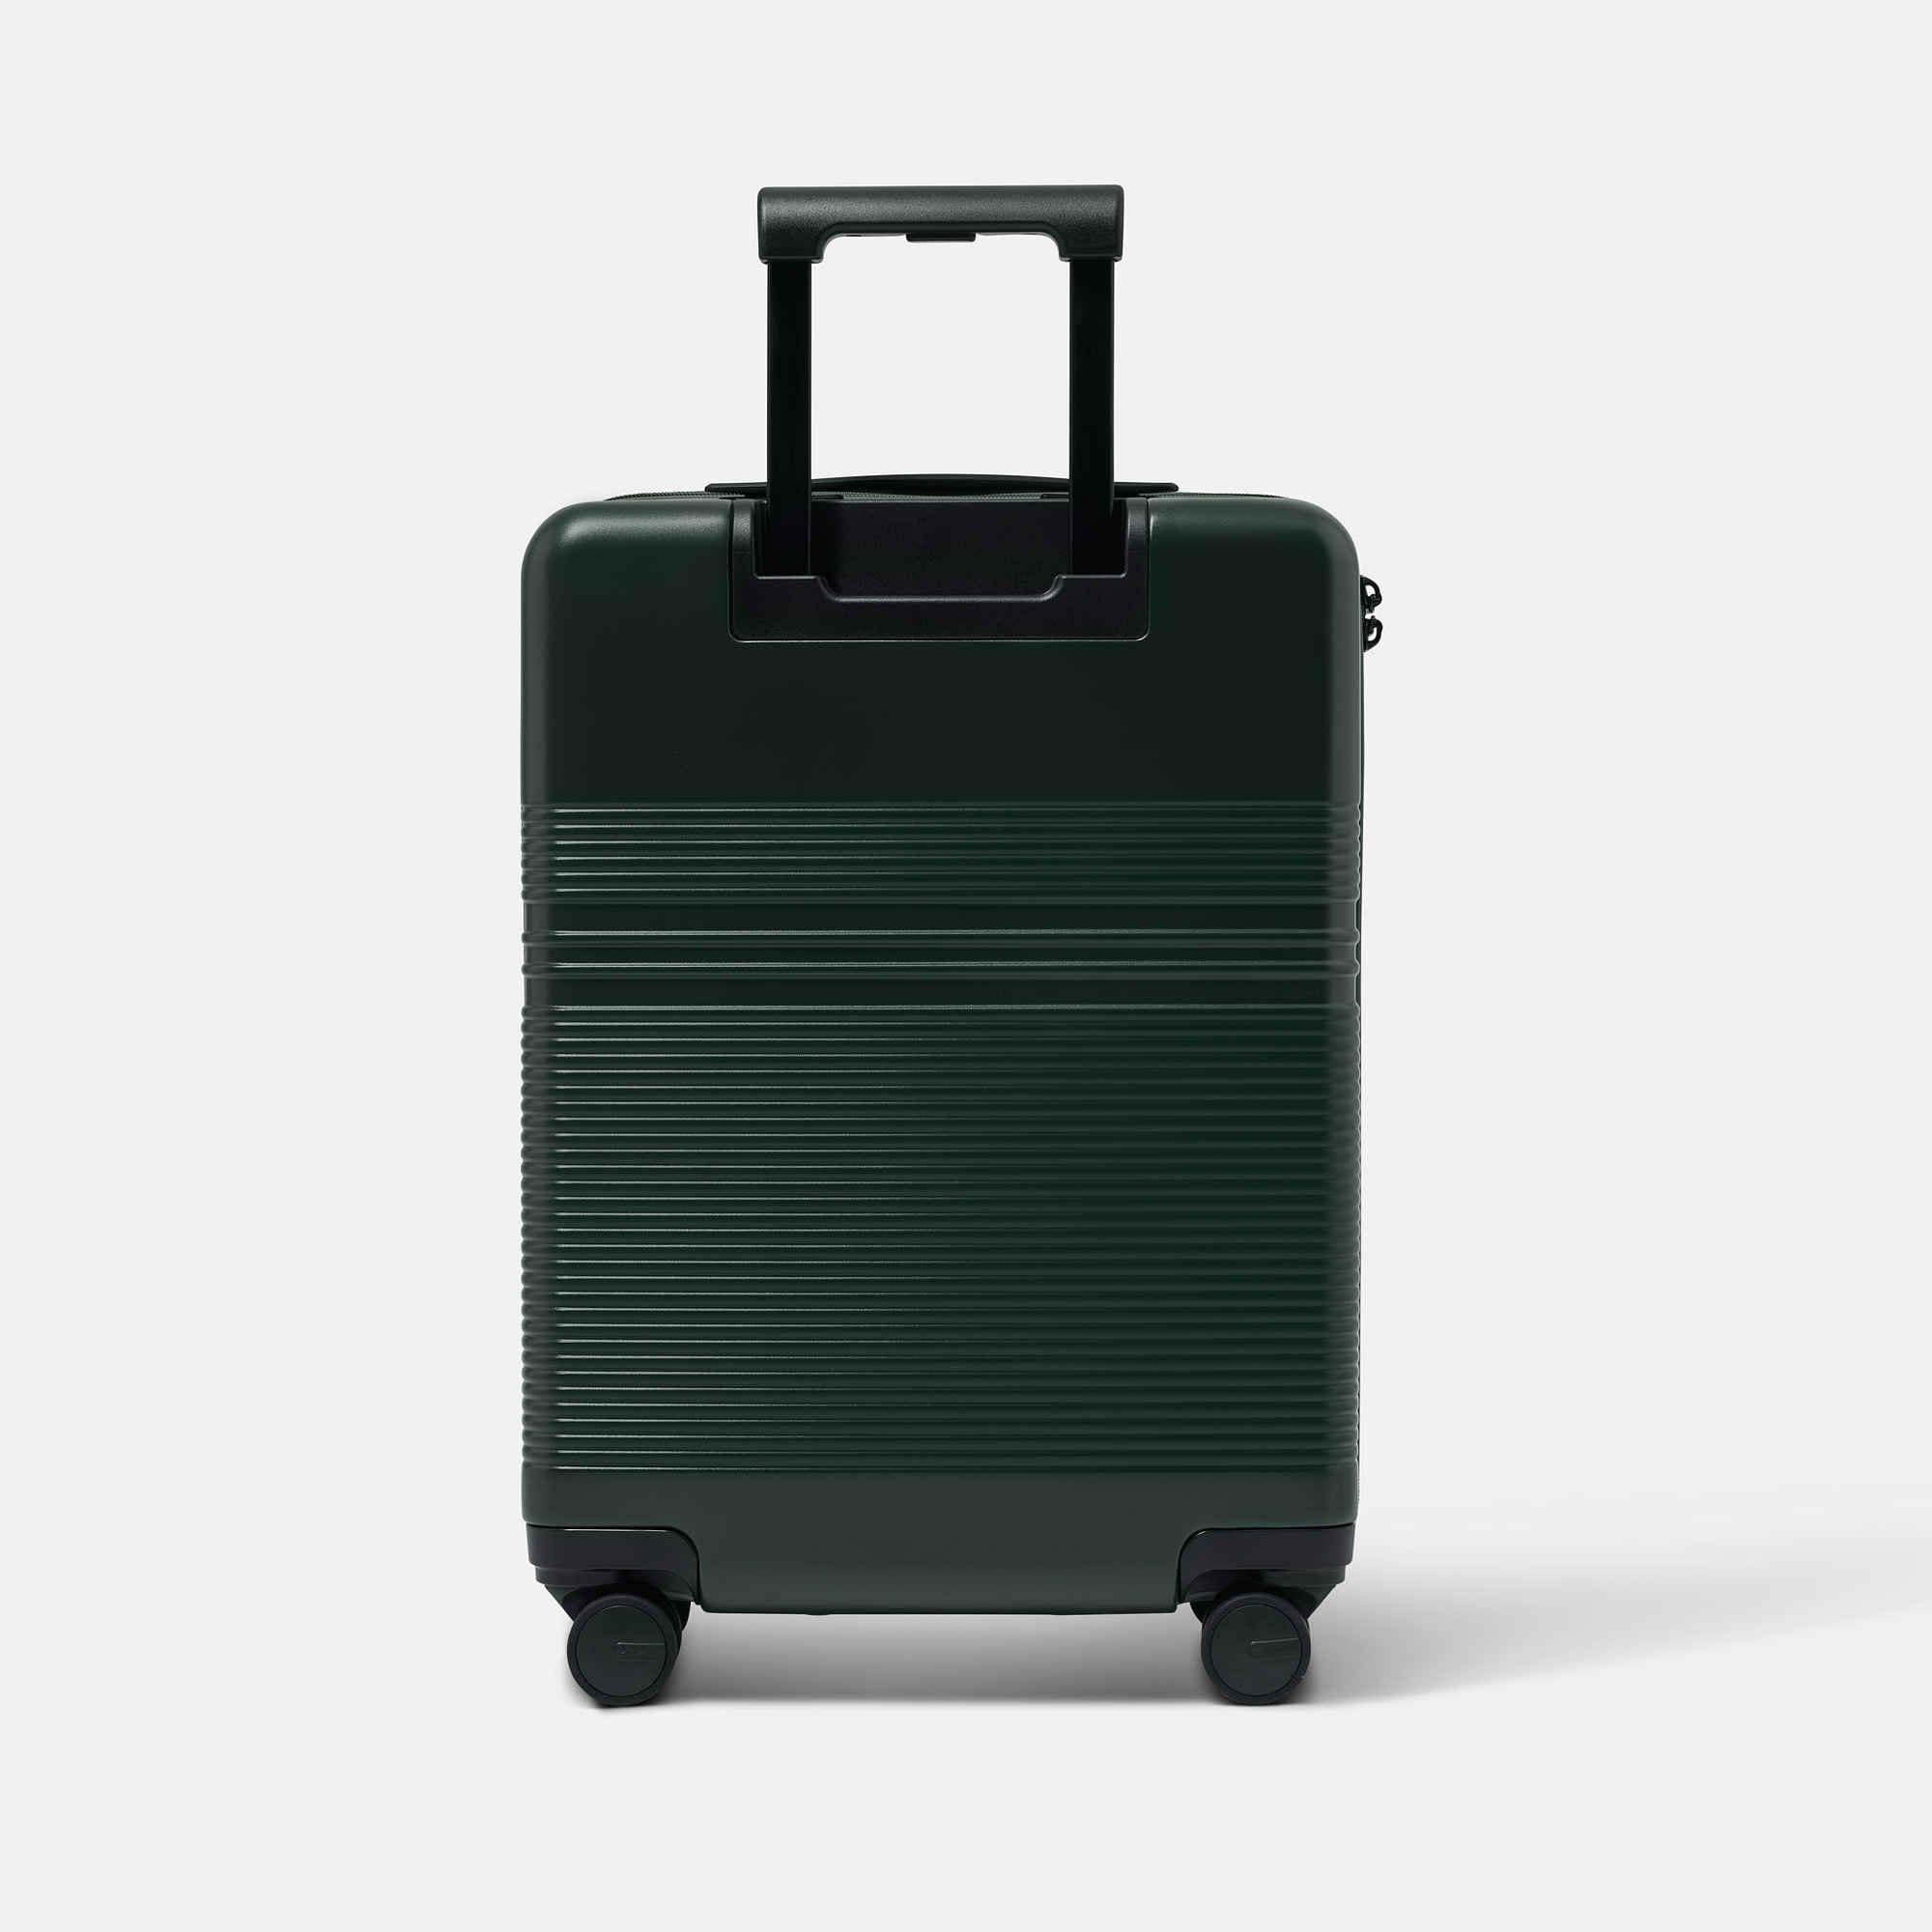 NORTVI sustainable design groen handbagage koffer, trolley suitcase gemaakt van duurzaam materiaal.